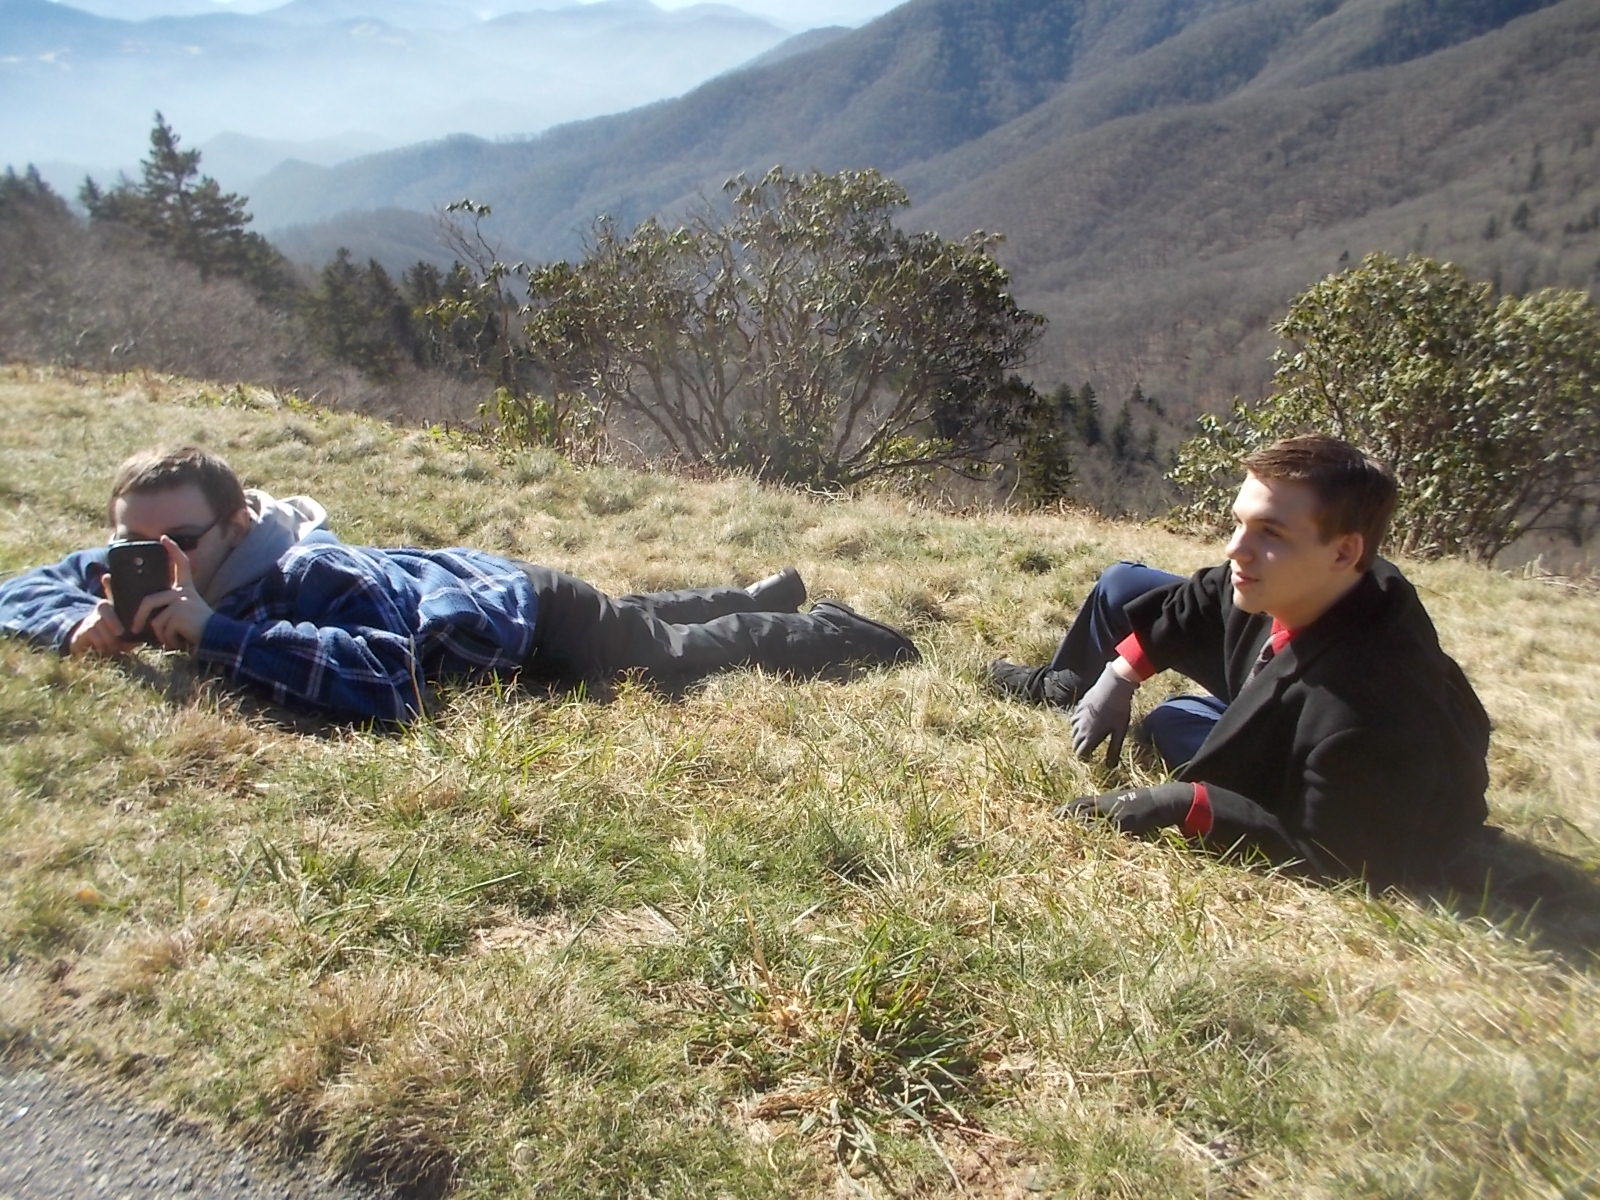 010216 D N lying on the mountain.JPG